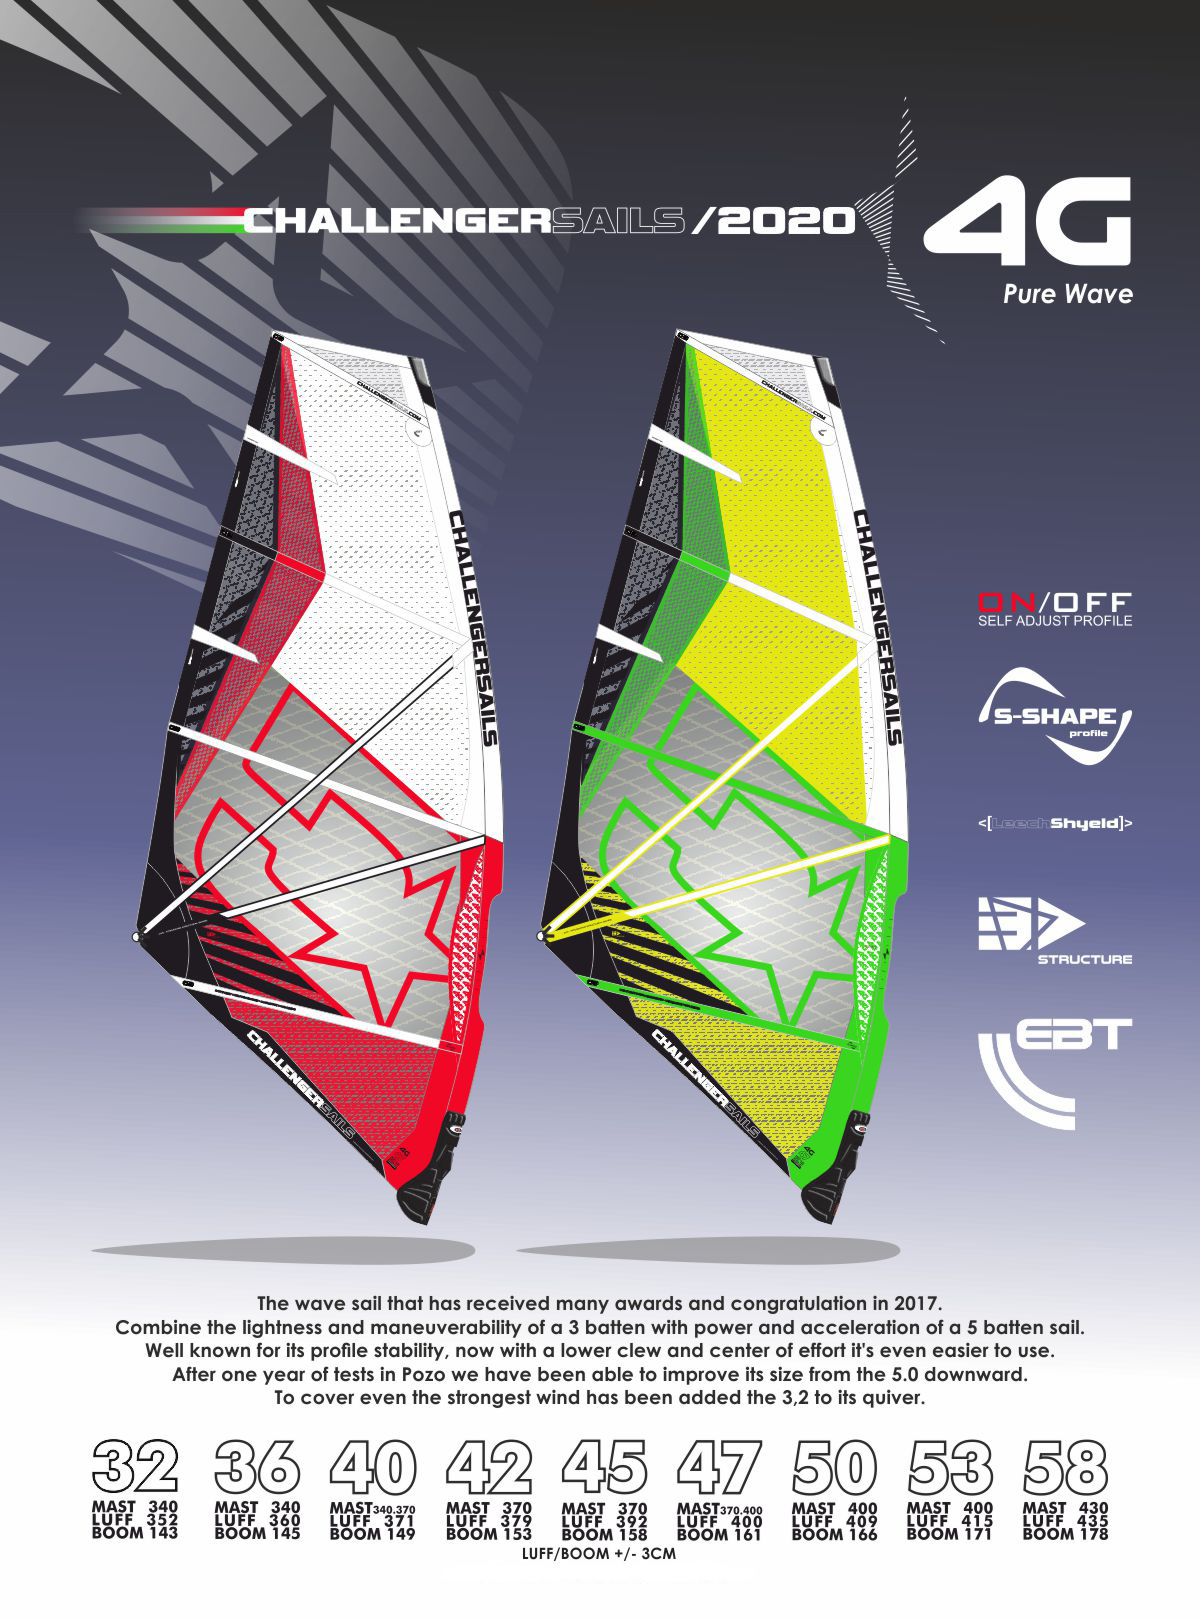 Challenger Sails 4G 2020